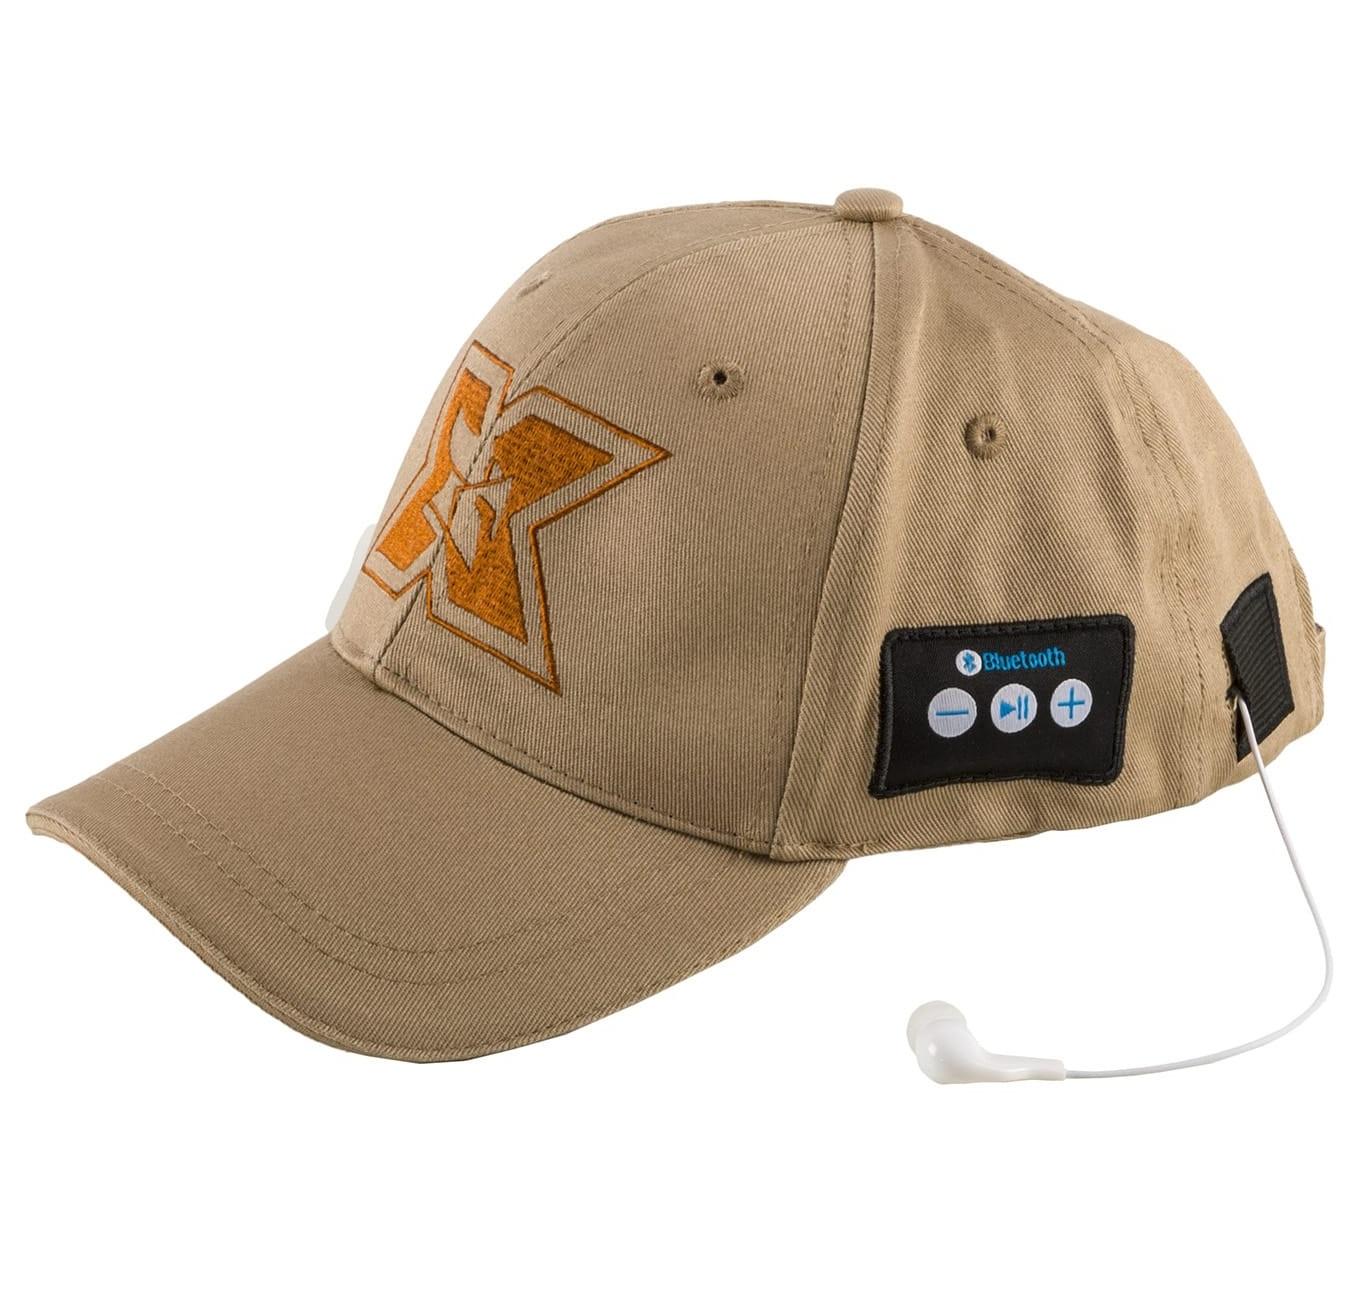 Sapca sport cu casti Bluetooth Serioux CAP05 kaki